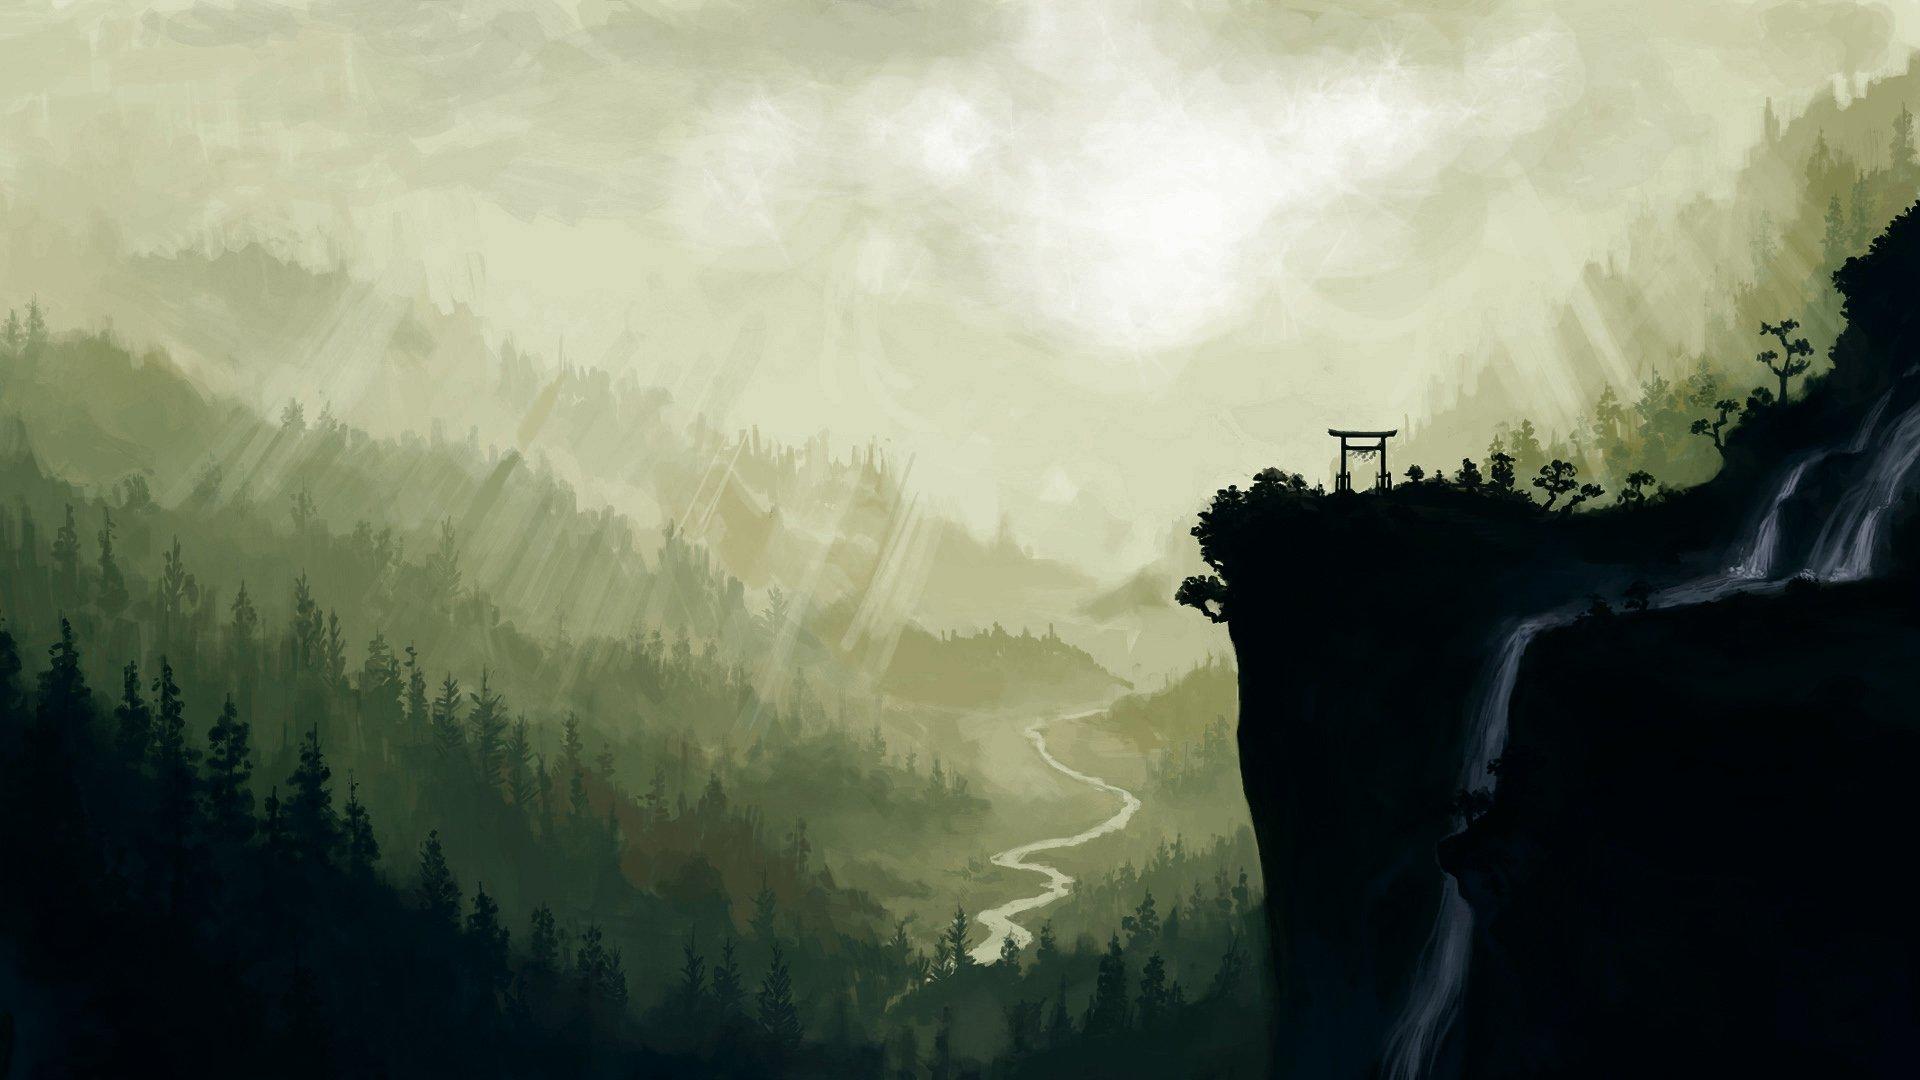 Drawn scenery desktop background HD Drawing HD Backgrounds 192